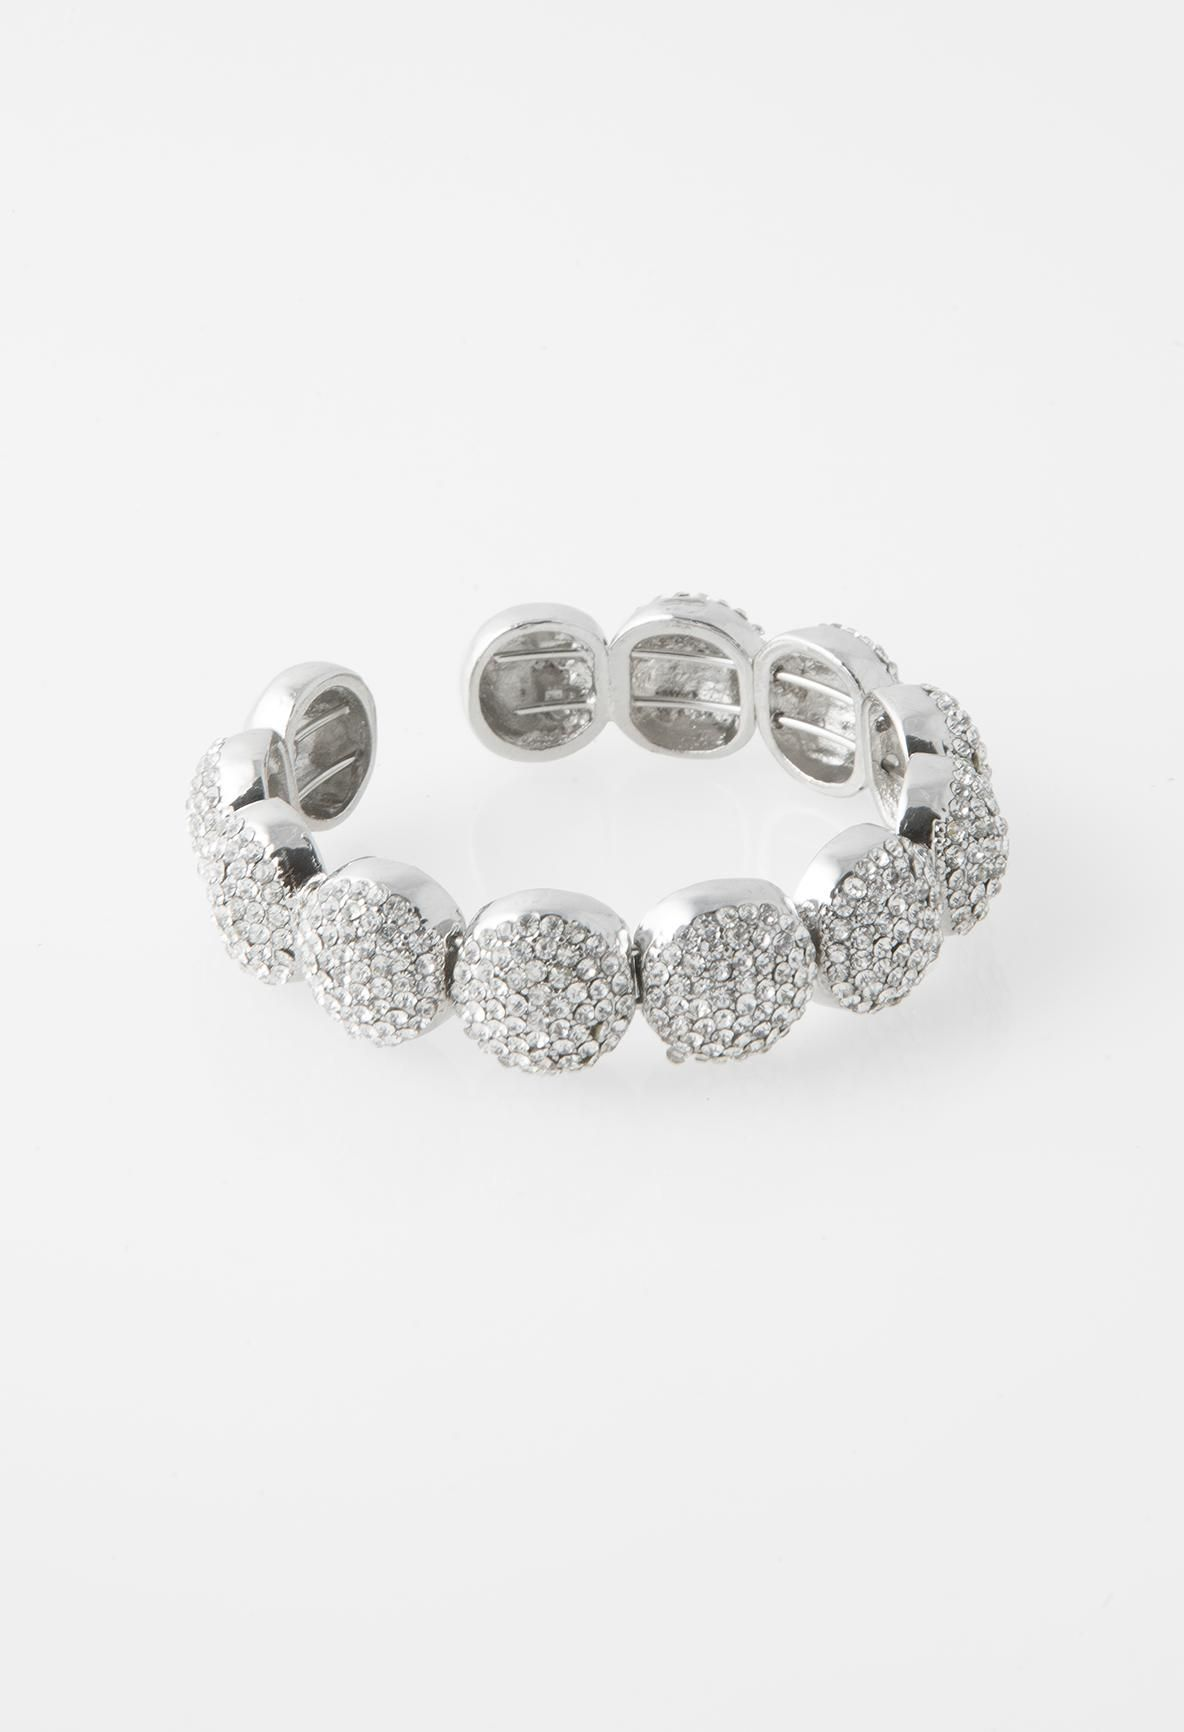 RHINESTONE OPEN END BRACELET #camillelavie #groupusa #jewelry #accessories #bracelet